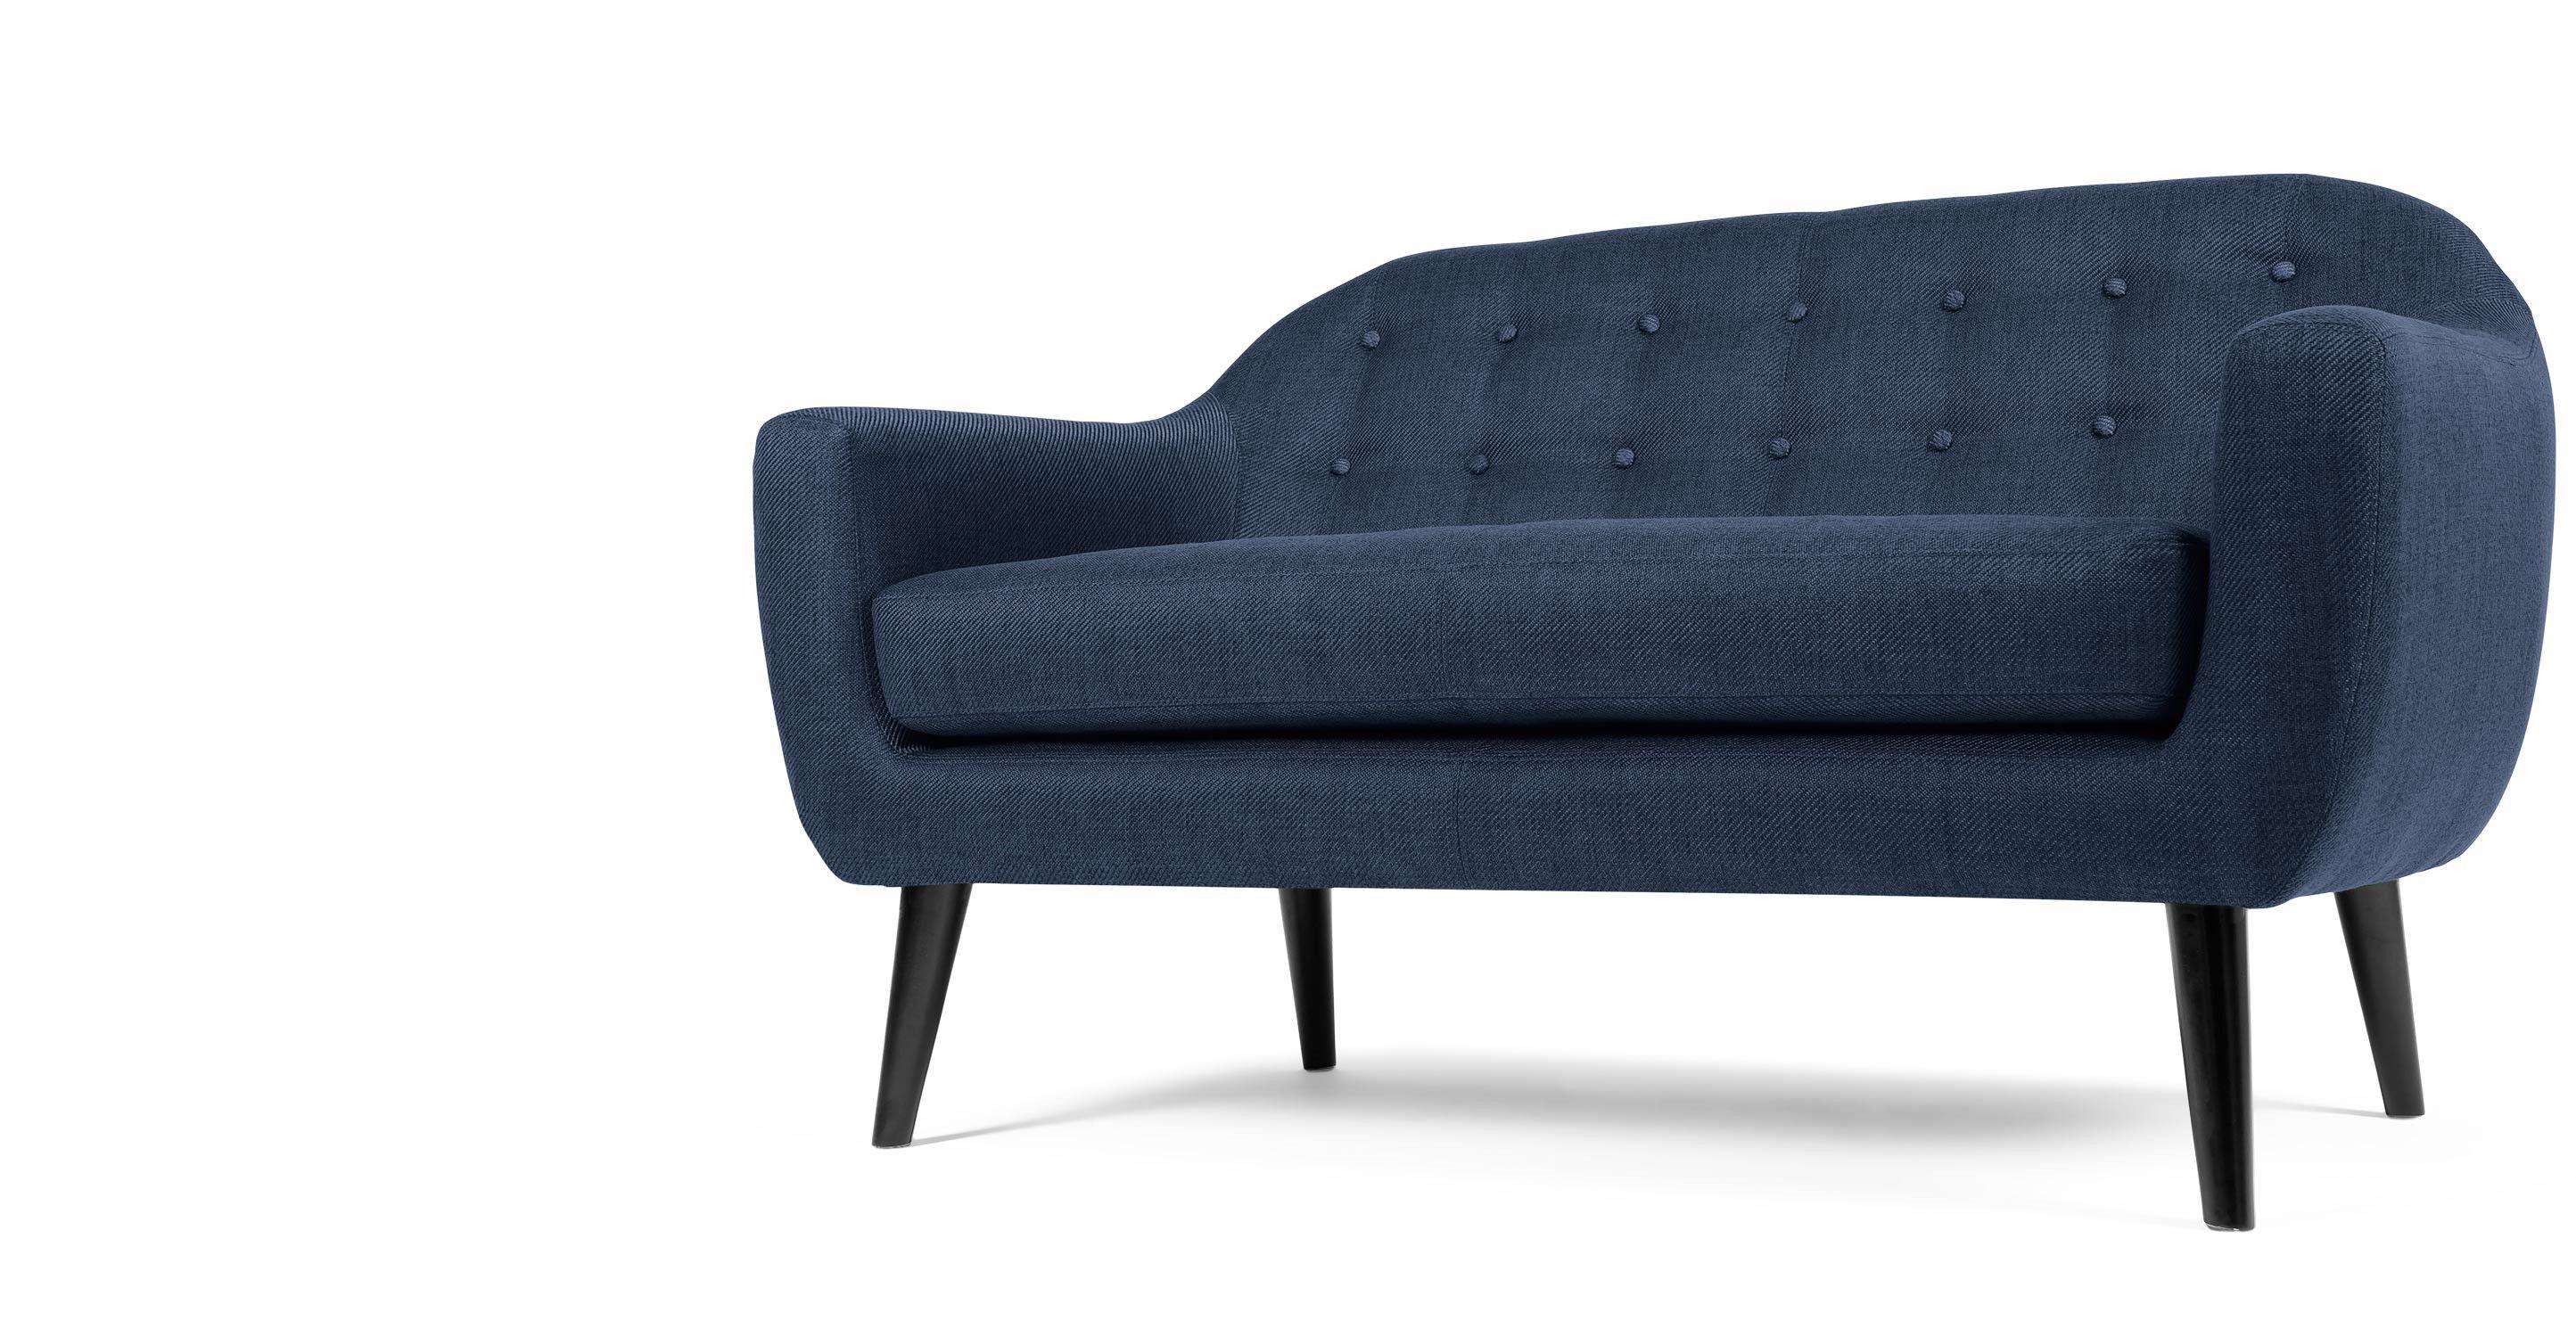 Ritchie 2-Sitzer Sofa, Dunkelblau | Pinterest | Colour pop, Danish ...